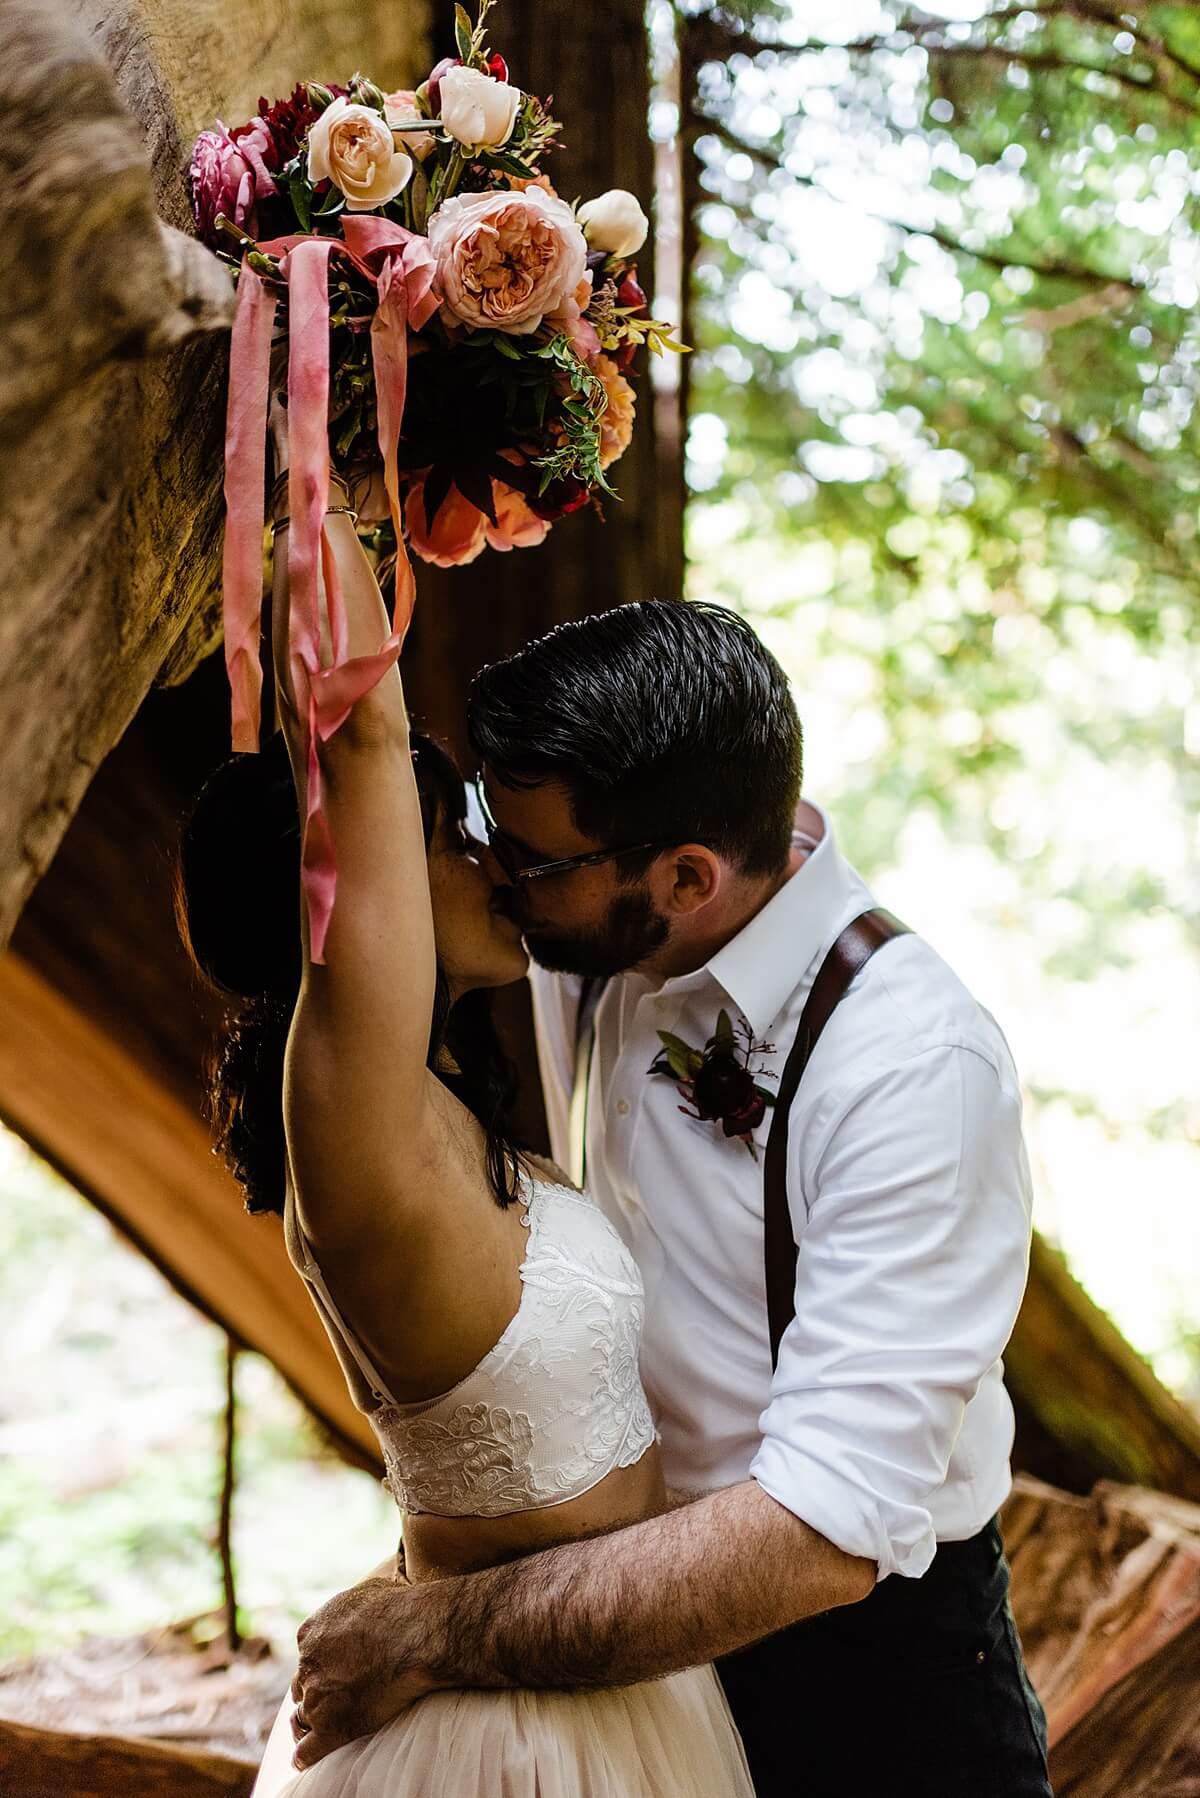 Allison-Brooks-Jedediah-Smiith-Redwoods-Adventure-Elopement-Wedding-S-Photography-Blog_0051.jpg